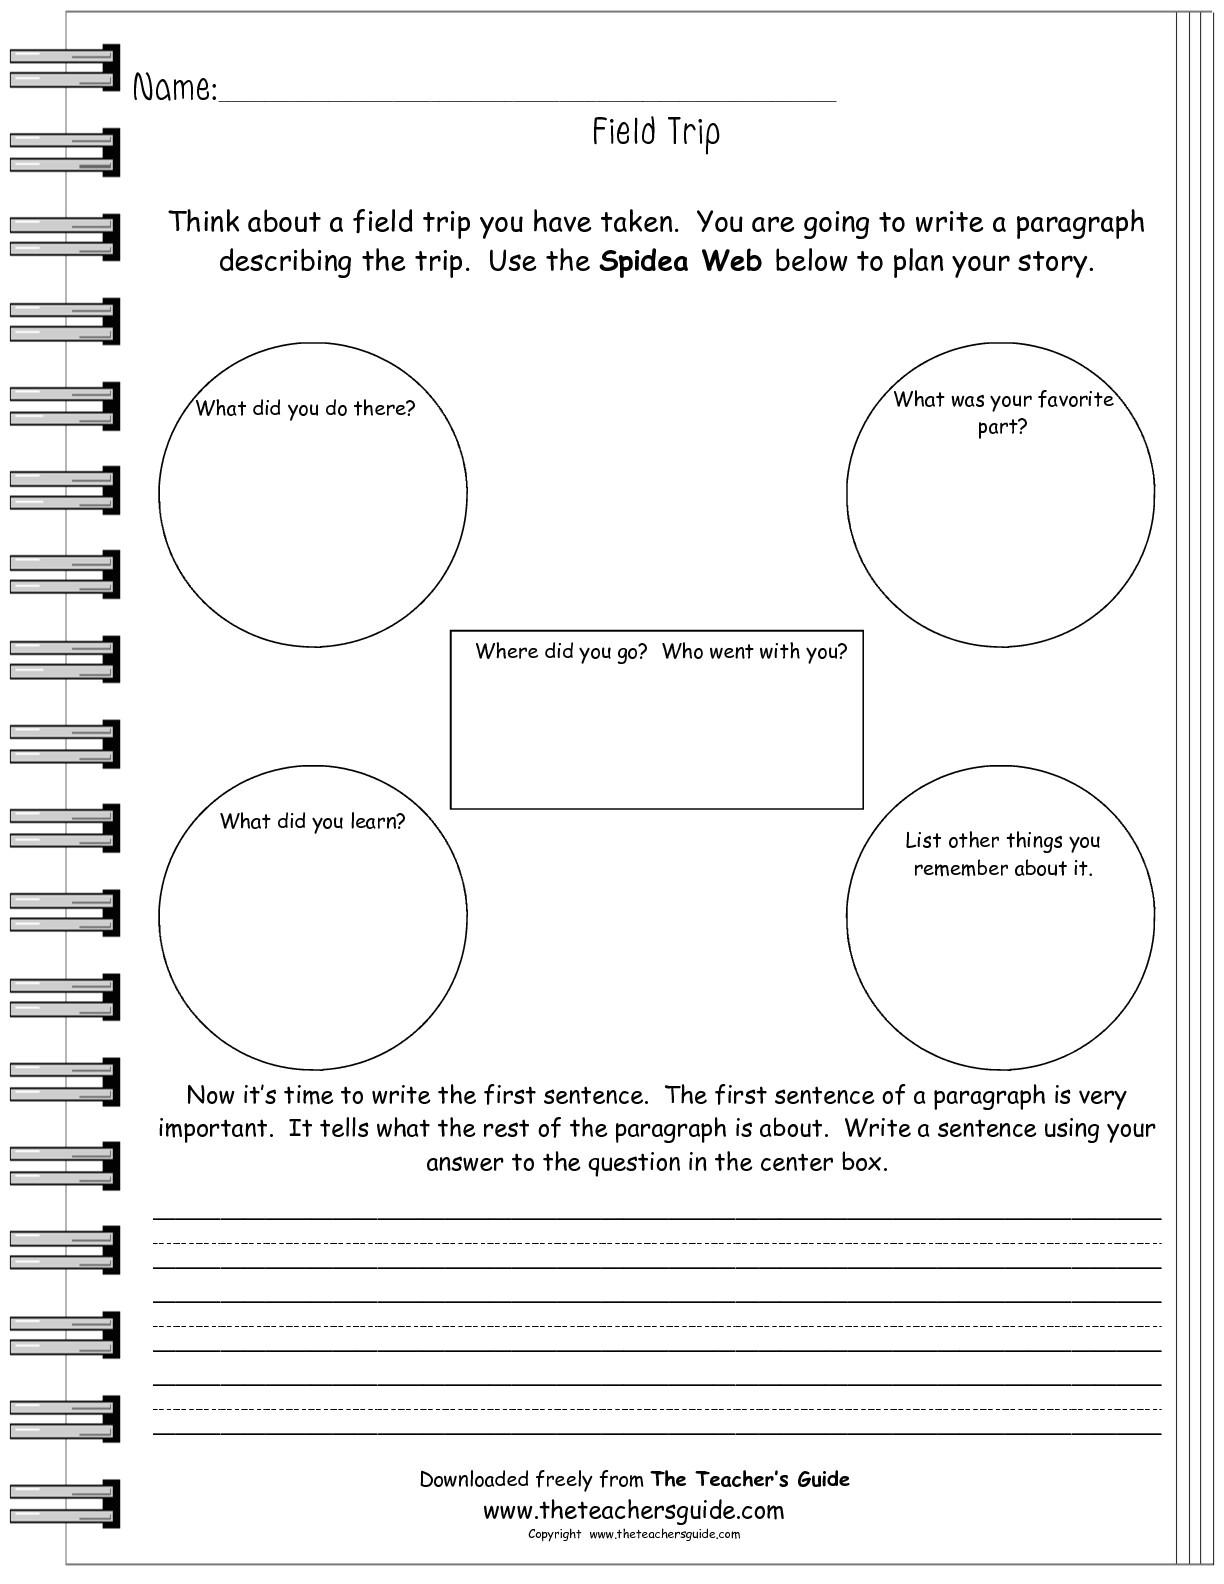 post field trip reflection worksheet 433437